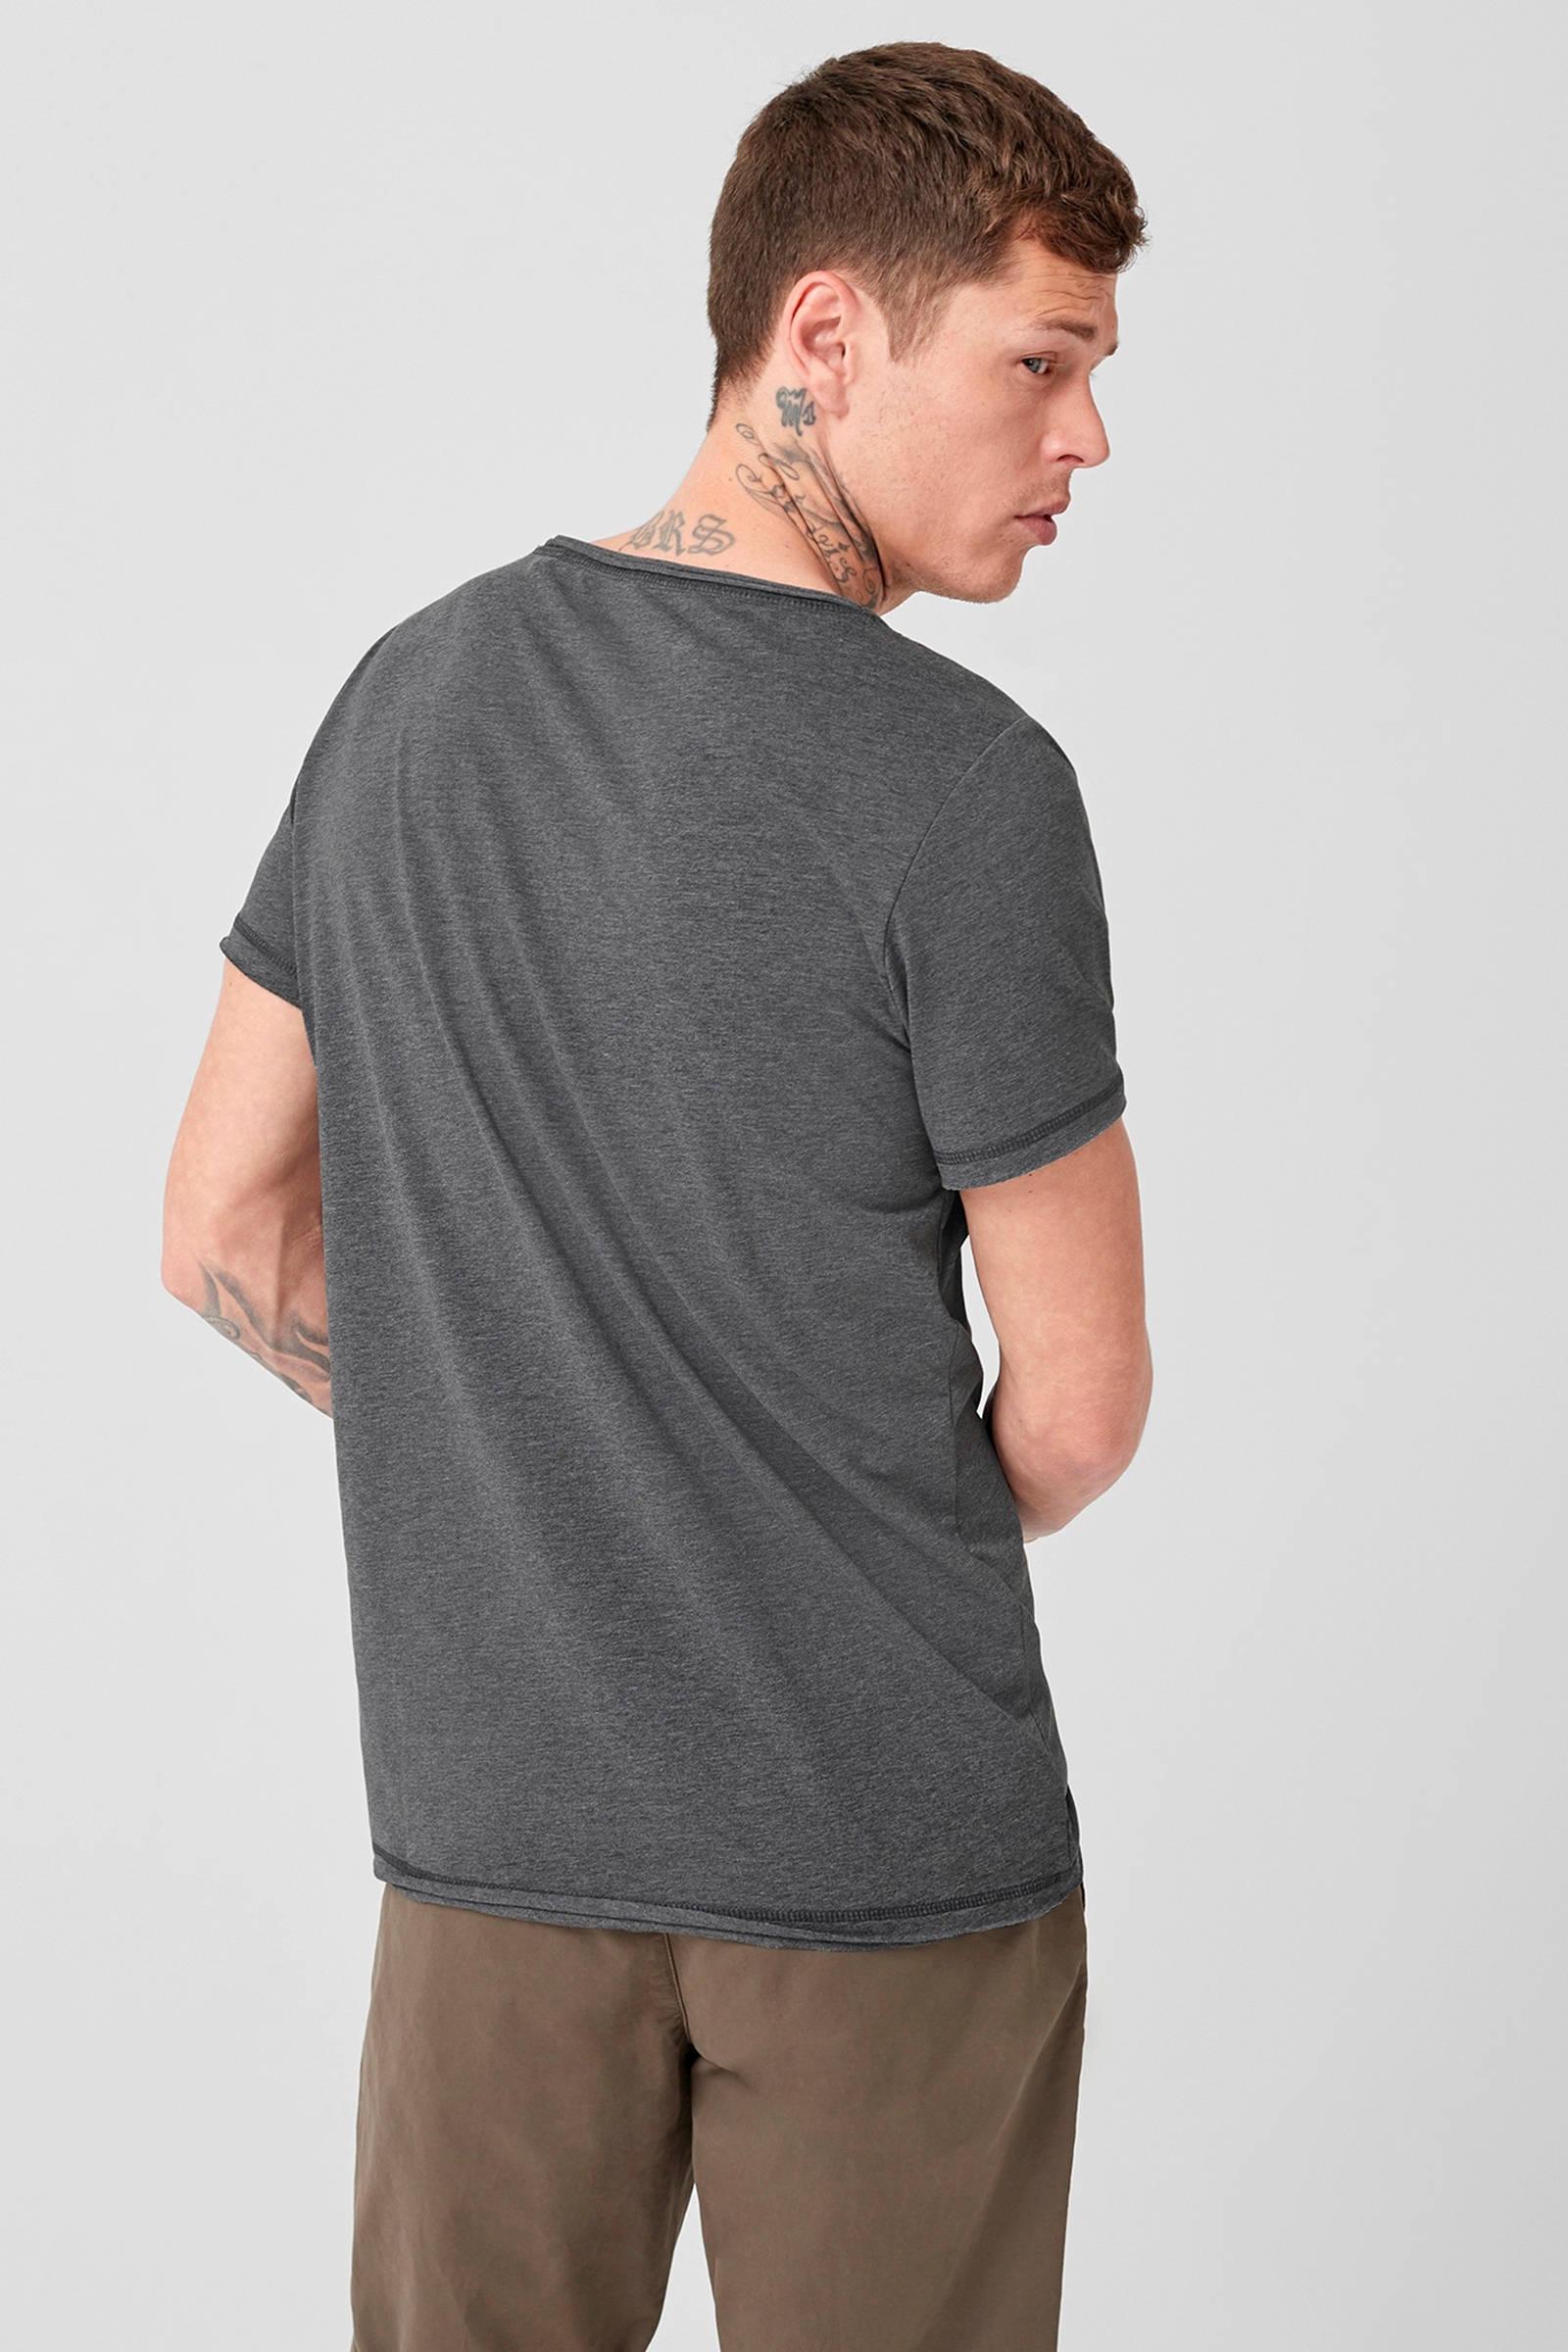 designed by T Q shirt S gpw00q5